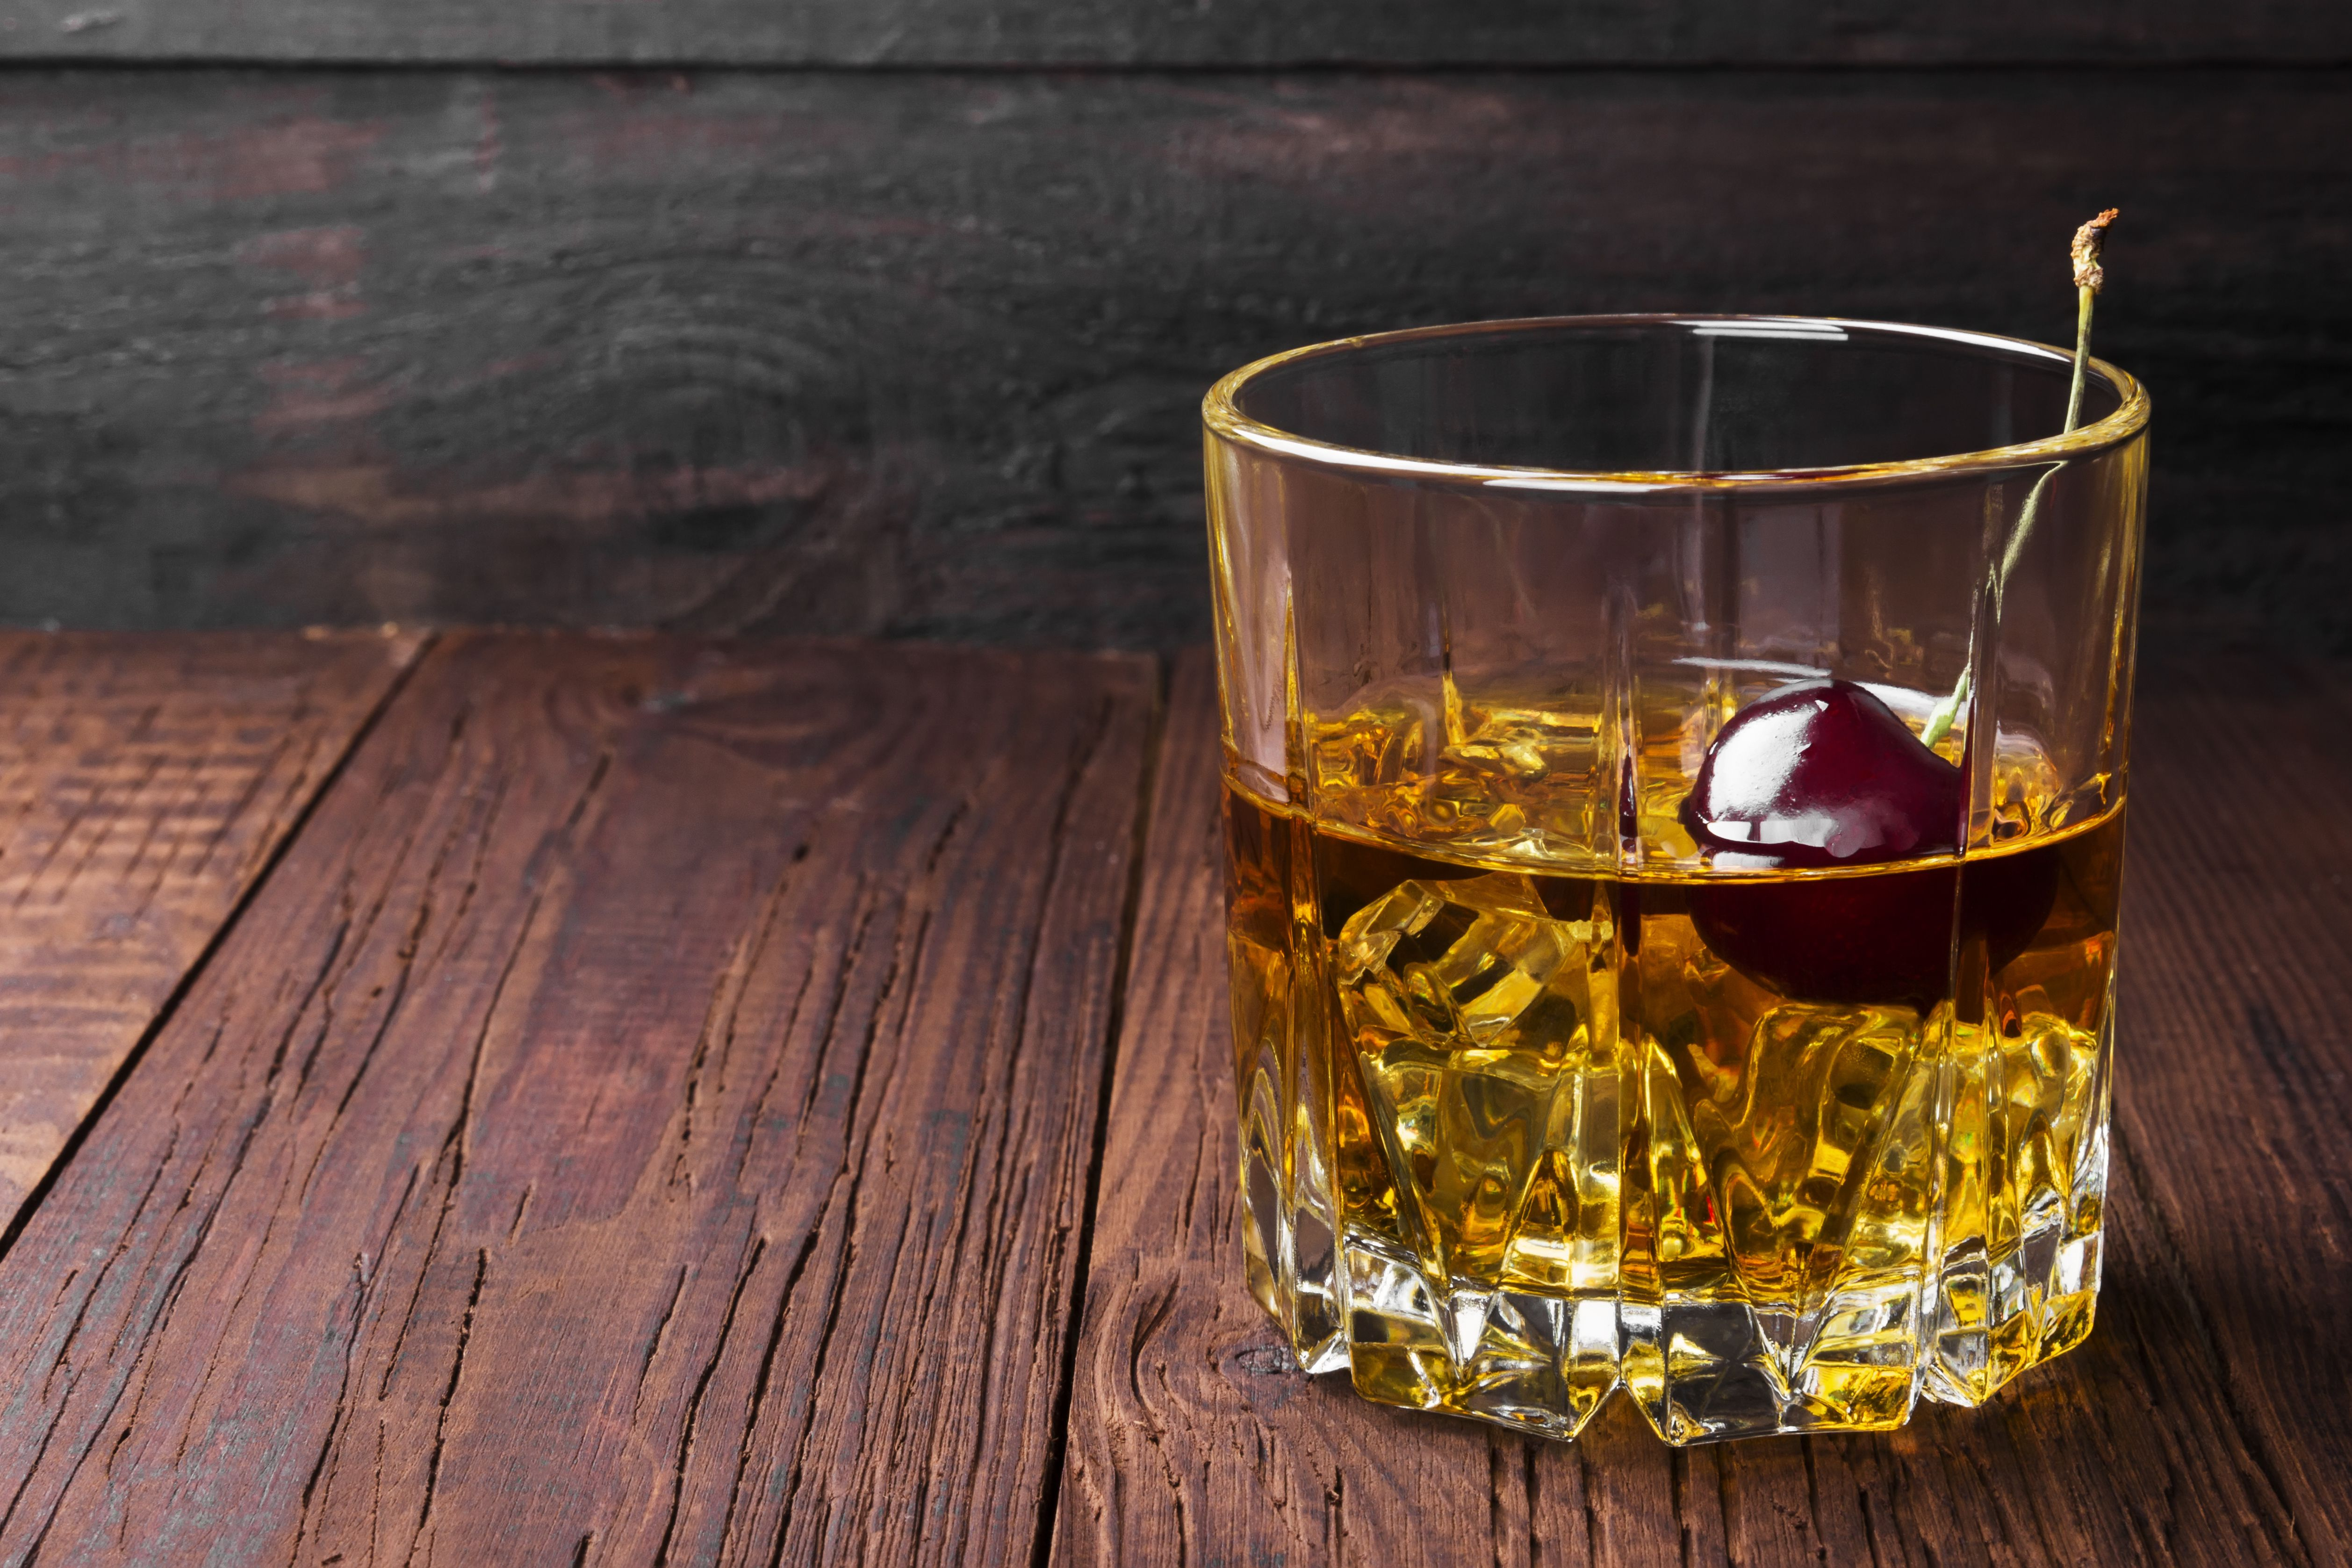 verre whisky original awesome filele tourne au verre aoc luberon chteau la canorguejpg with. Black Bedroom Furniture Sets. Home Design Ideas